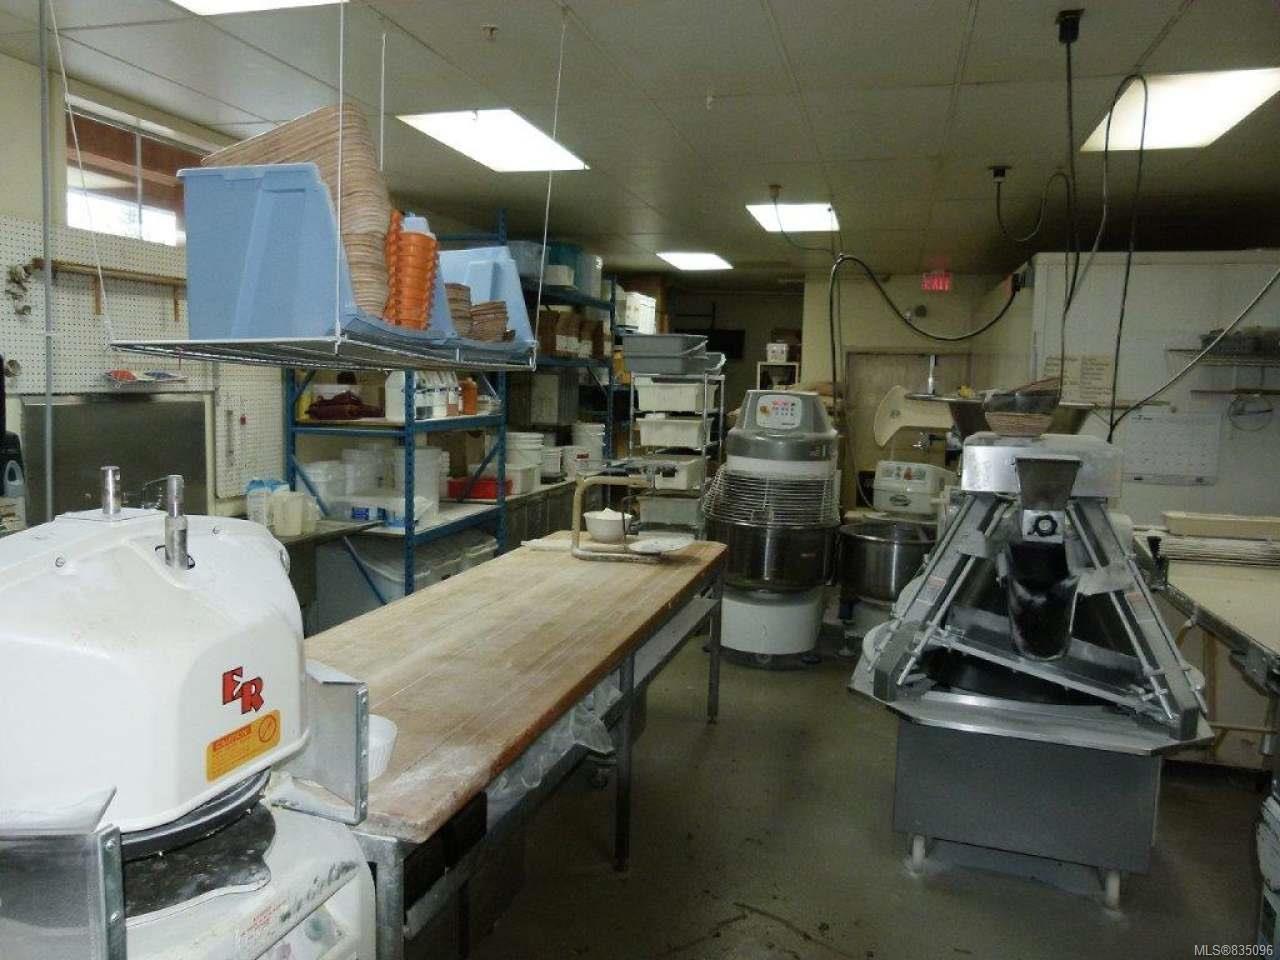 Photo 32: Photos: 2025 Bowen Rd in NANAIMO: Na Central Nanaimo Mixed Use for sale (Nanaimo)  : MLS®# 835096